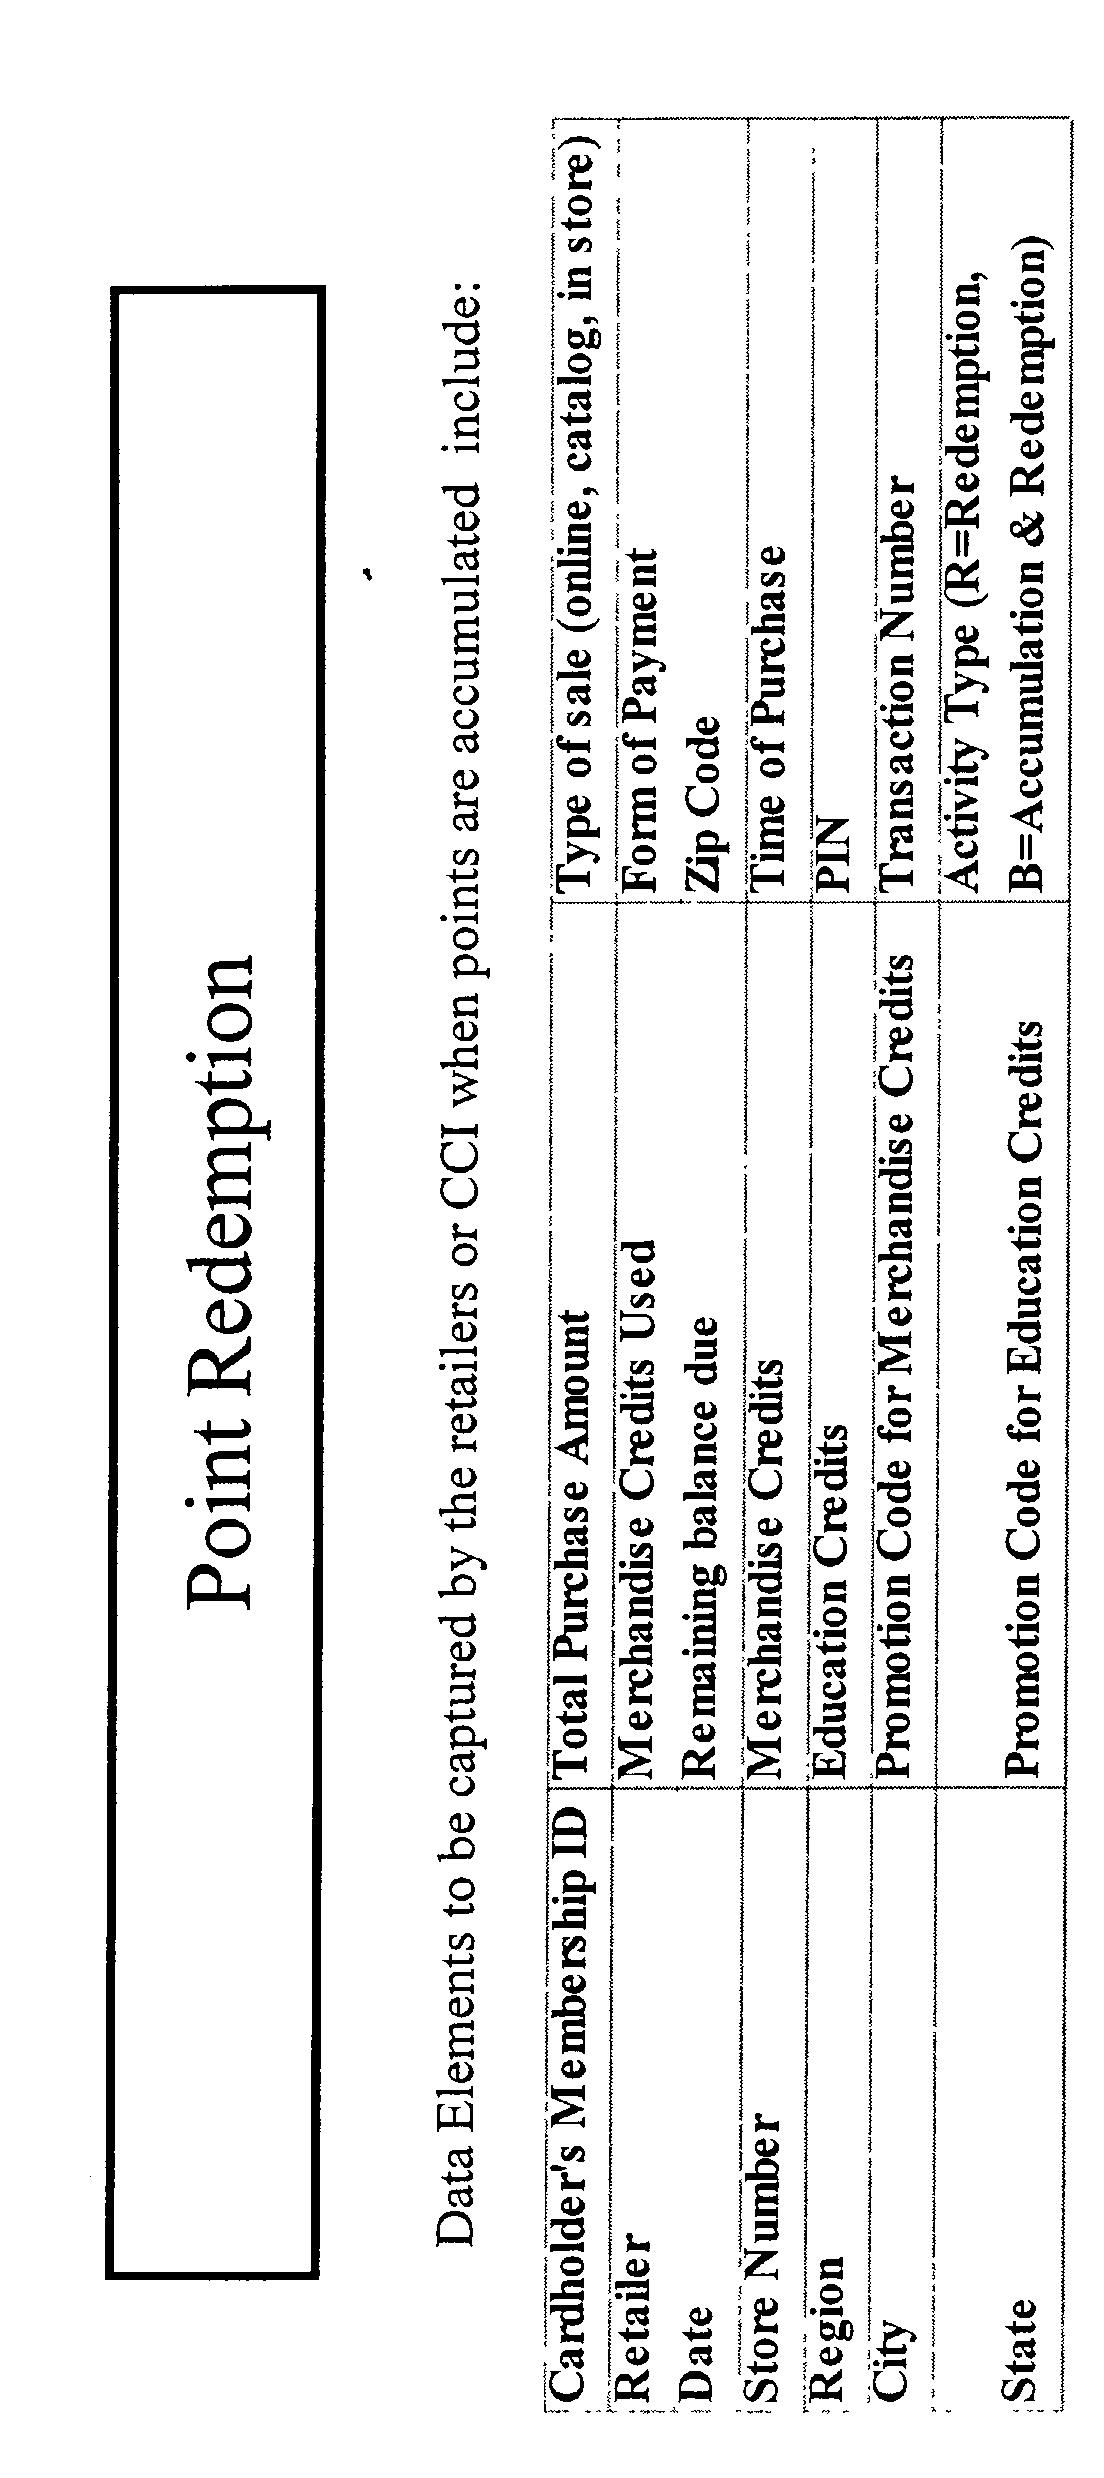 Figure US20030023491A1-20030130-P00077